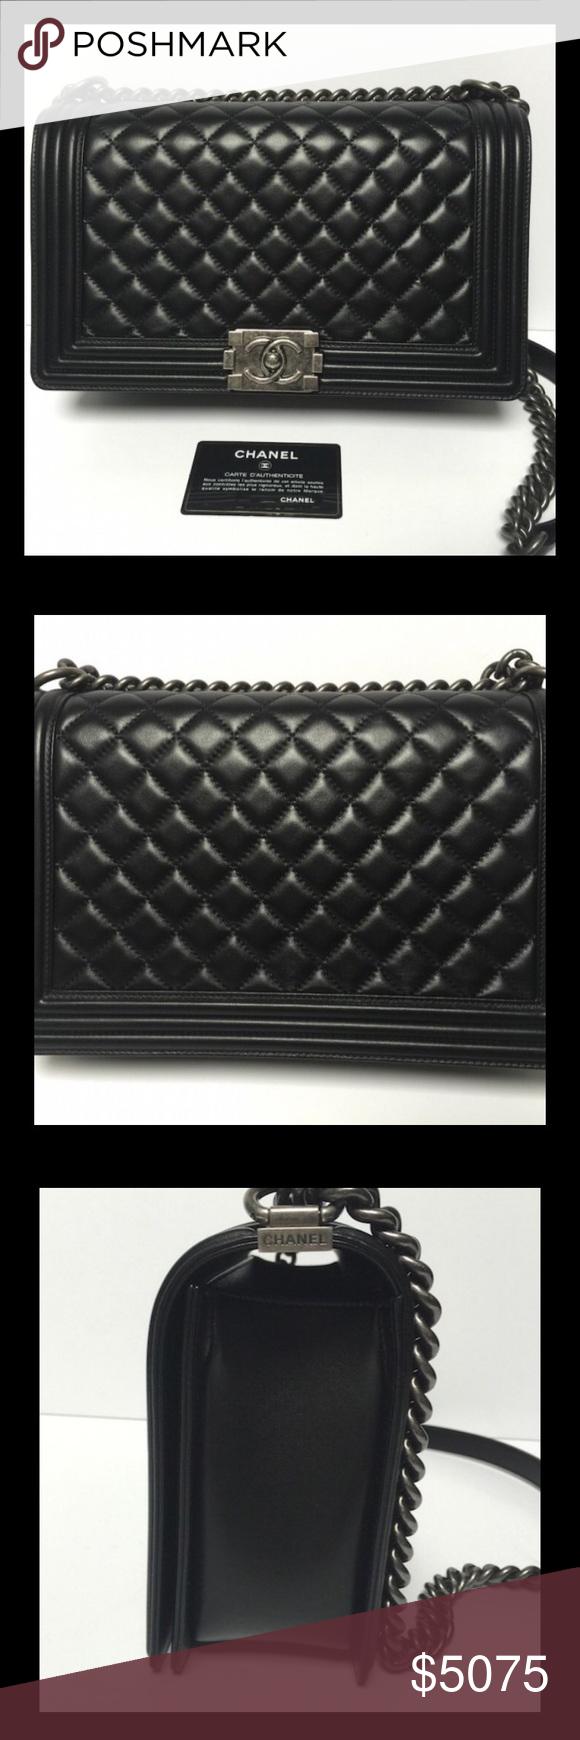 043360dc294a CHANEL BOY NEW MEDIUM BLACK LAMBSKIN RUTHENIUM HW Chanel Boy New Medium in  Black Lambskin with